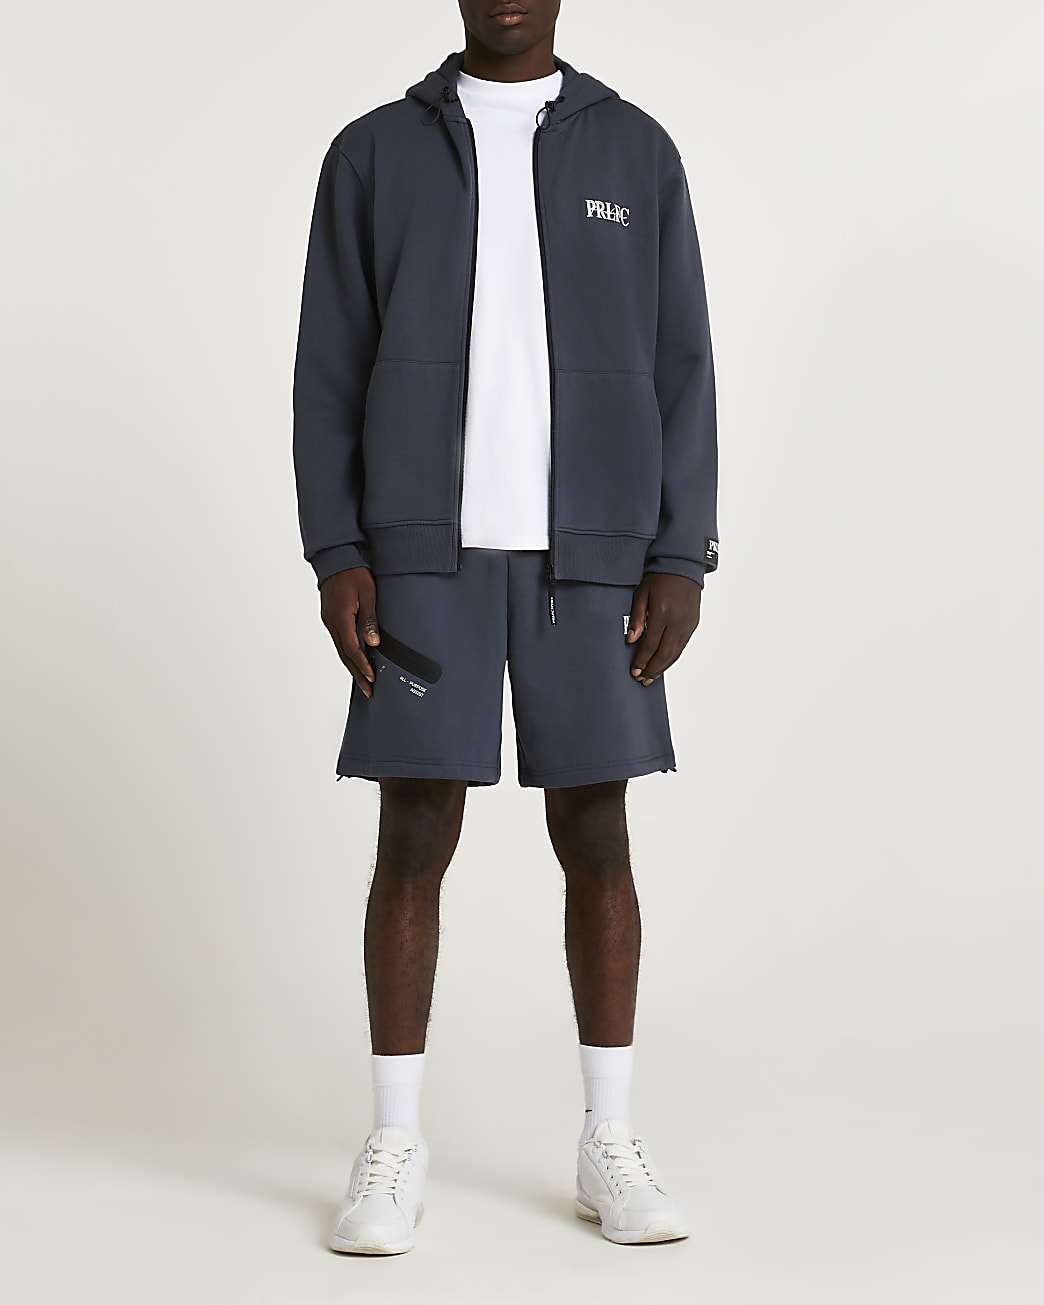 Prolific grey regular fit shorts